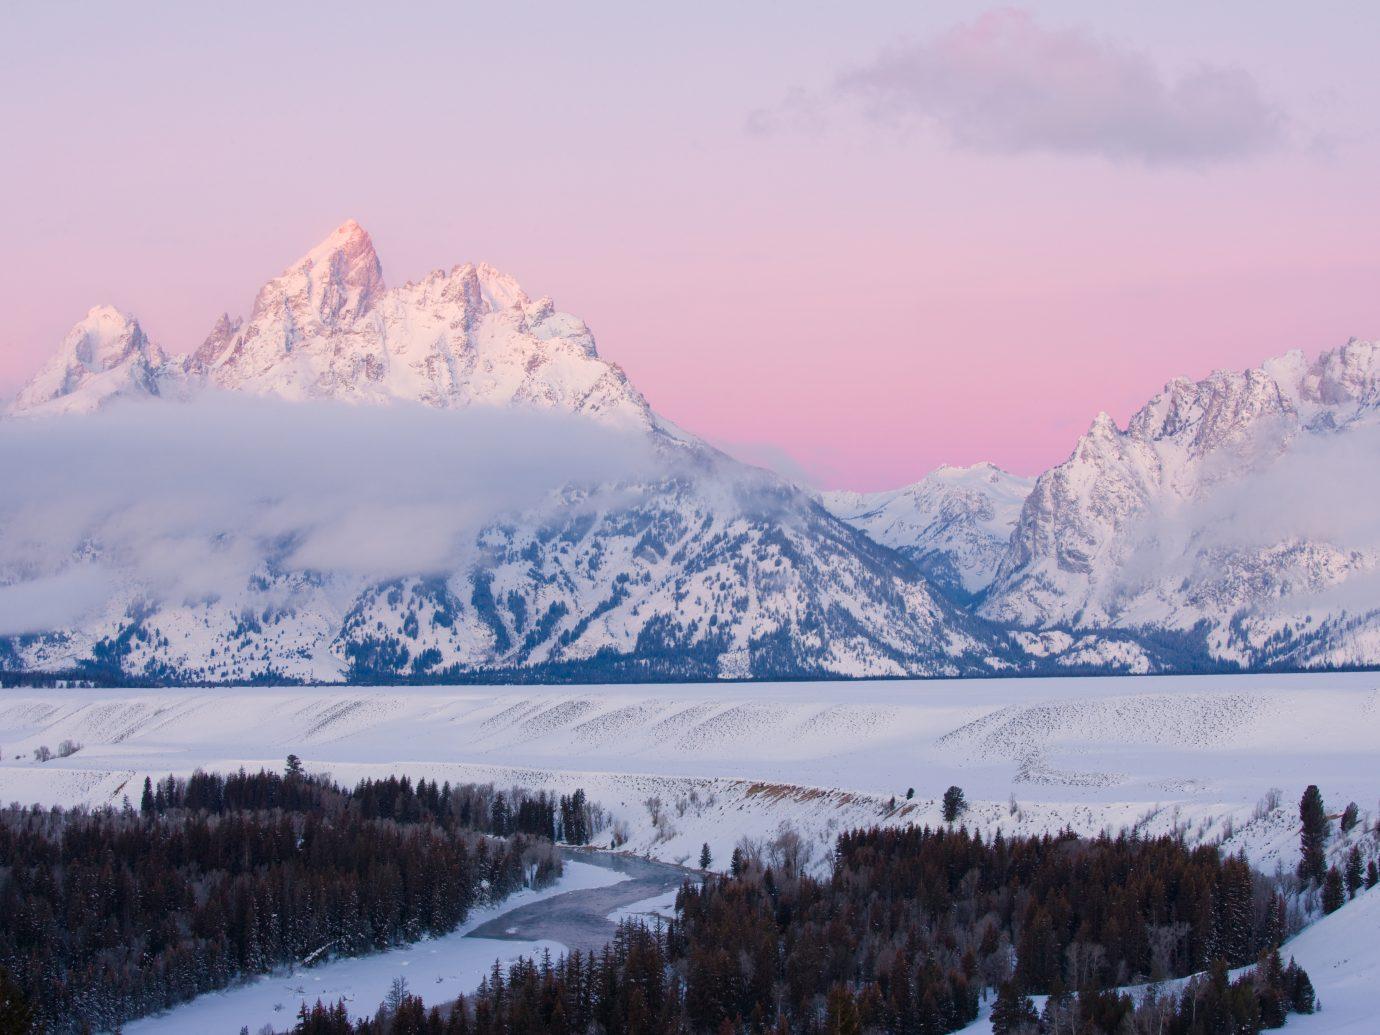 """Teton mountain range at sunrise in winter snow. Snake River overlook, Grand Tetons National Park, Wyoming MORE TETON MOUNTAINS"""